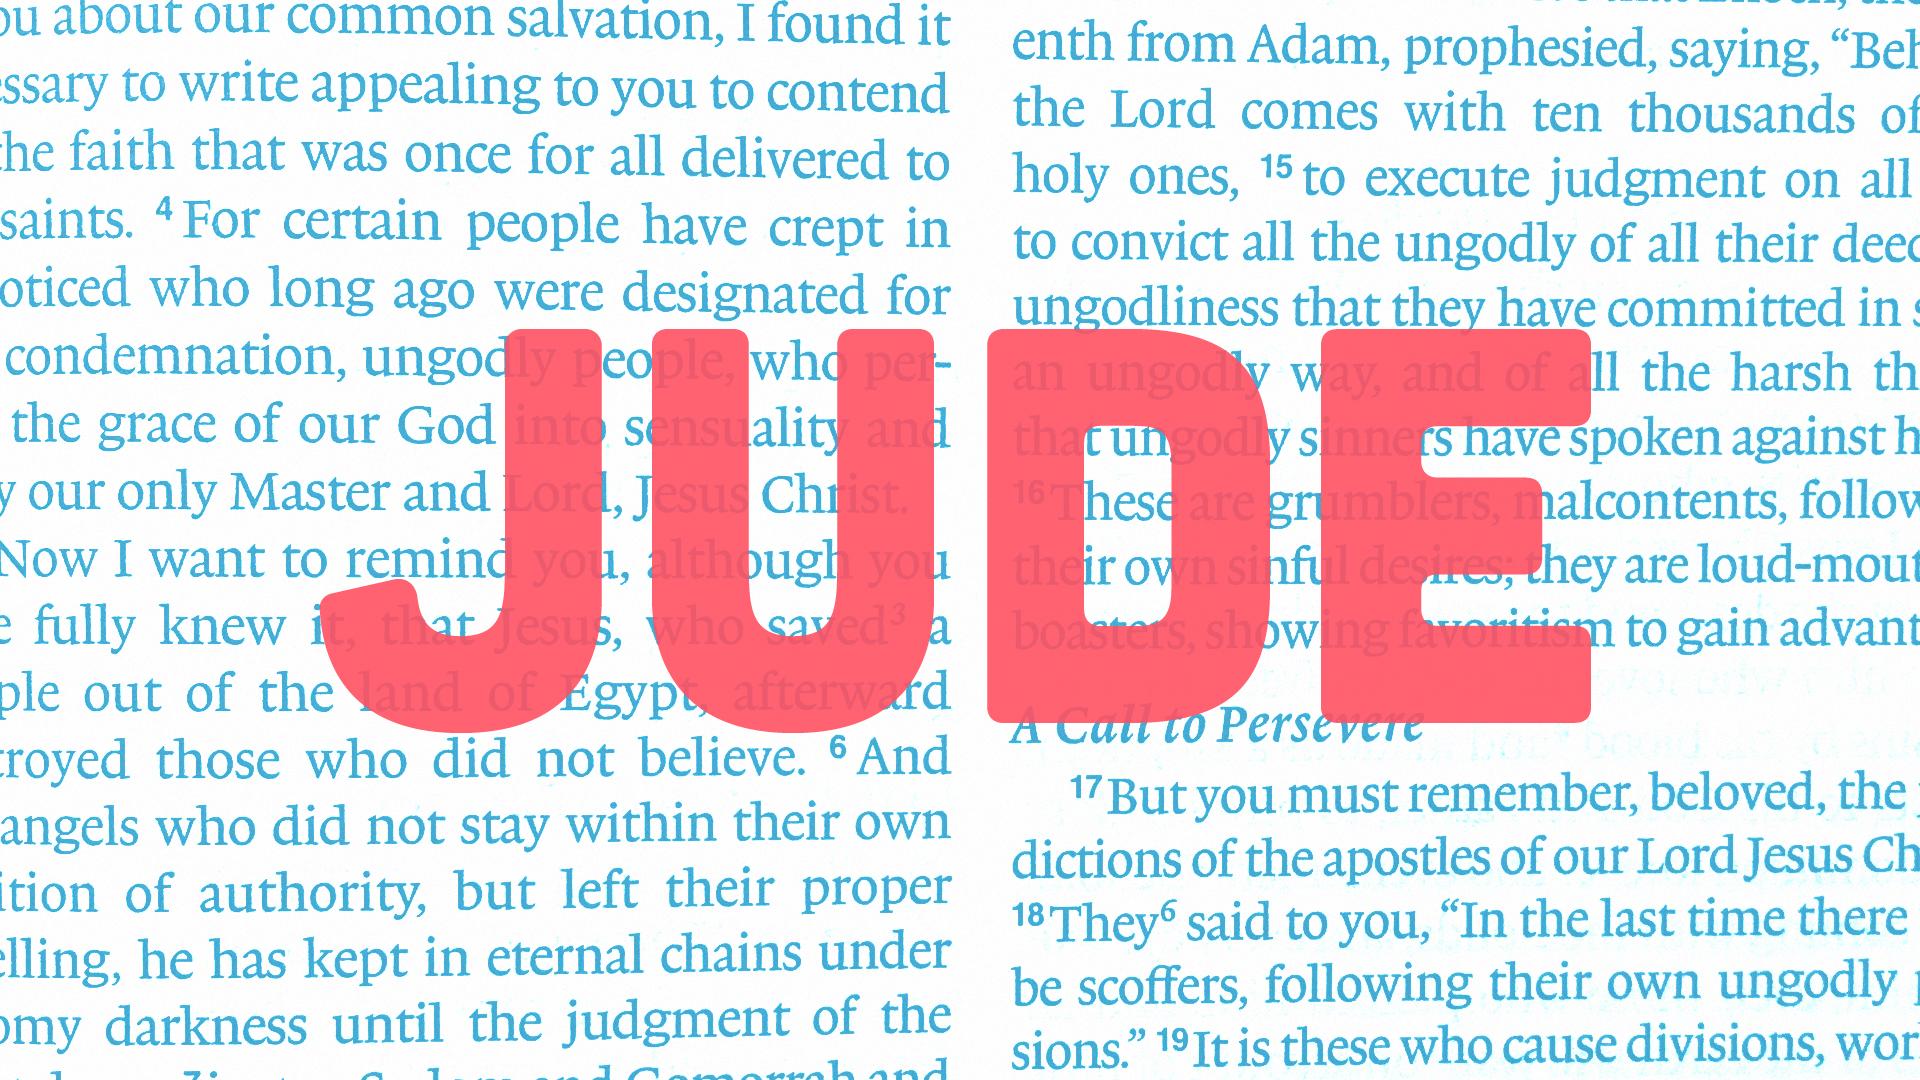 JUDE Sermon Art_1920x1080.png